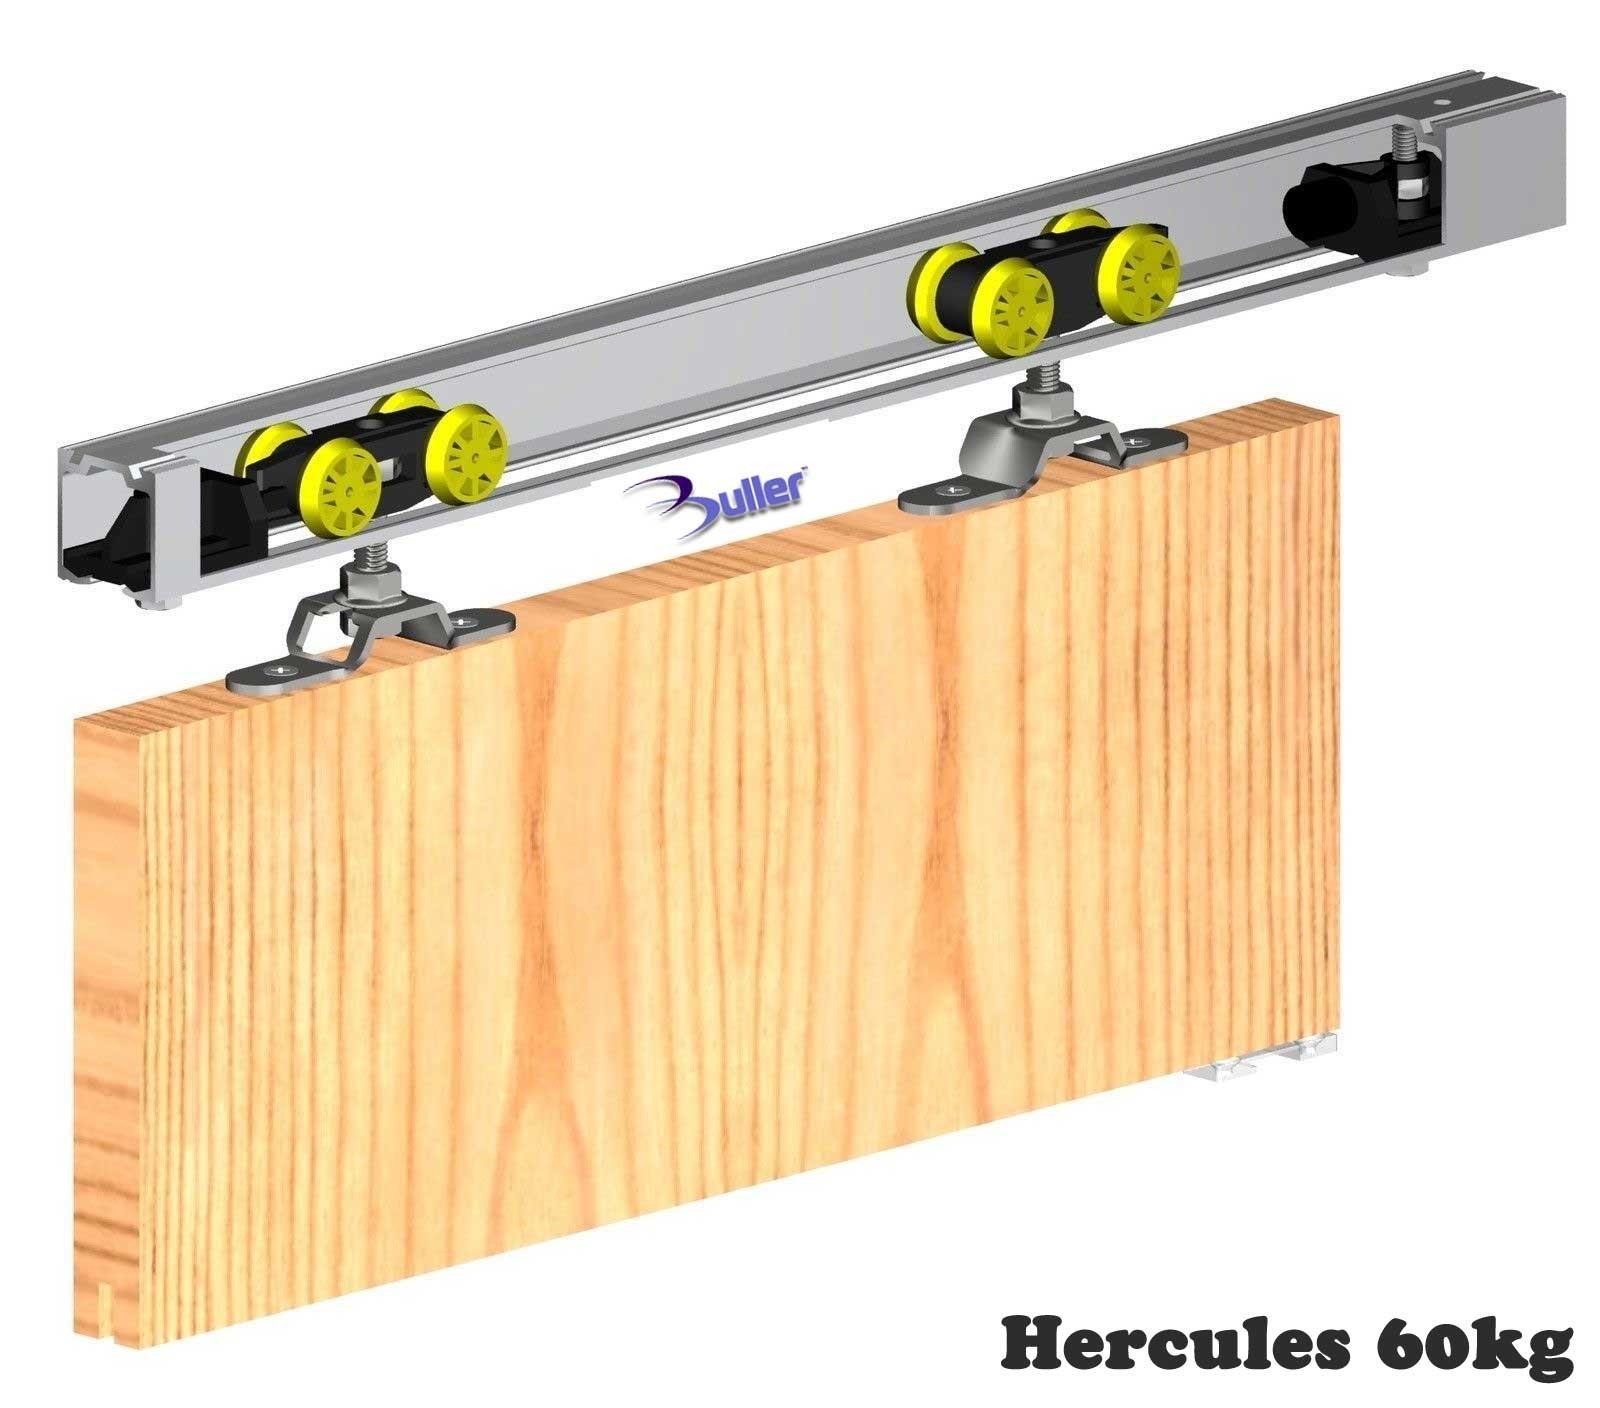 Top Hung Sliding Doors Hardwarehercules sliding door gear top hung track and rollers for 60kg